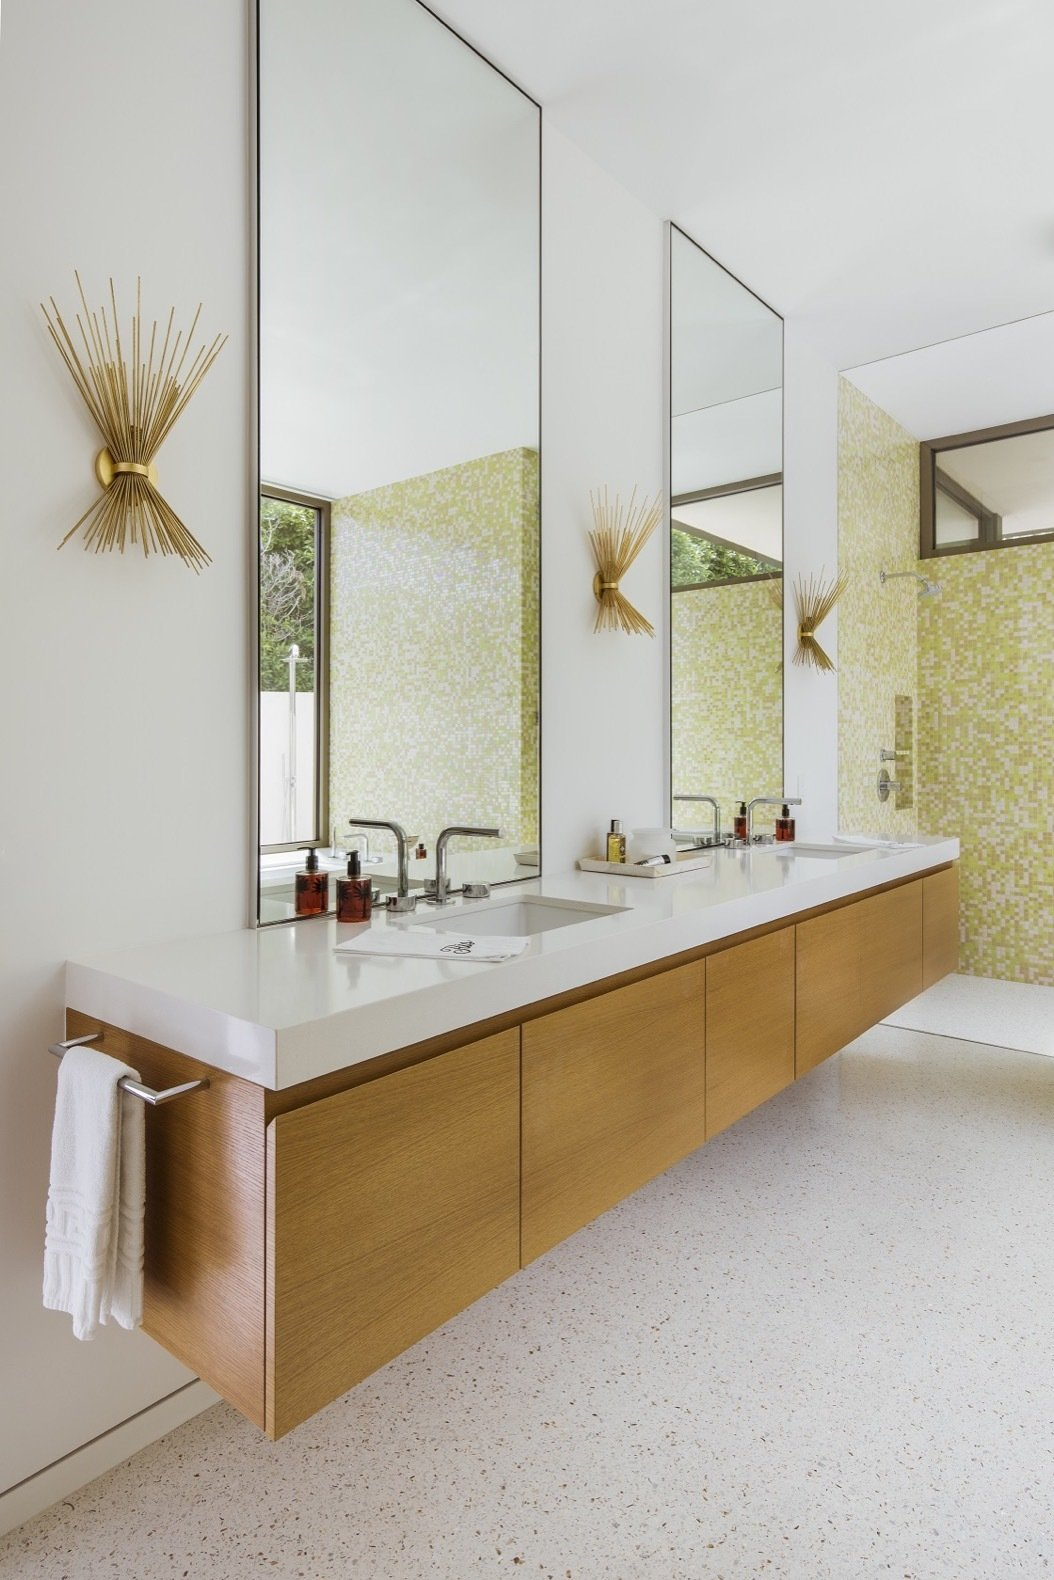 Best Bath Engineered Quartz Terrazzo Photos from A Stale